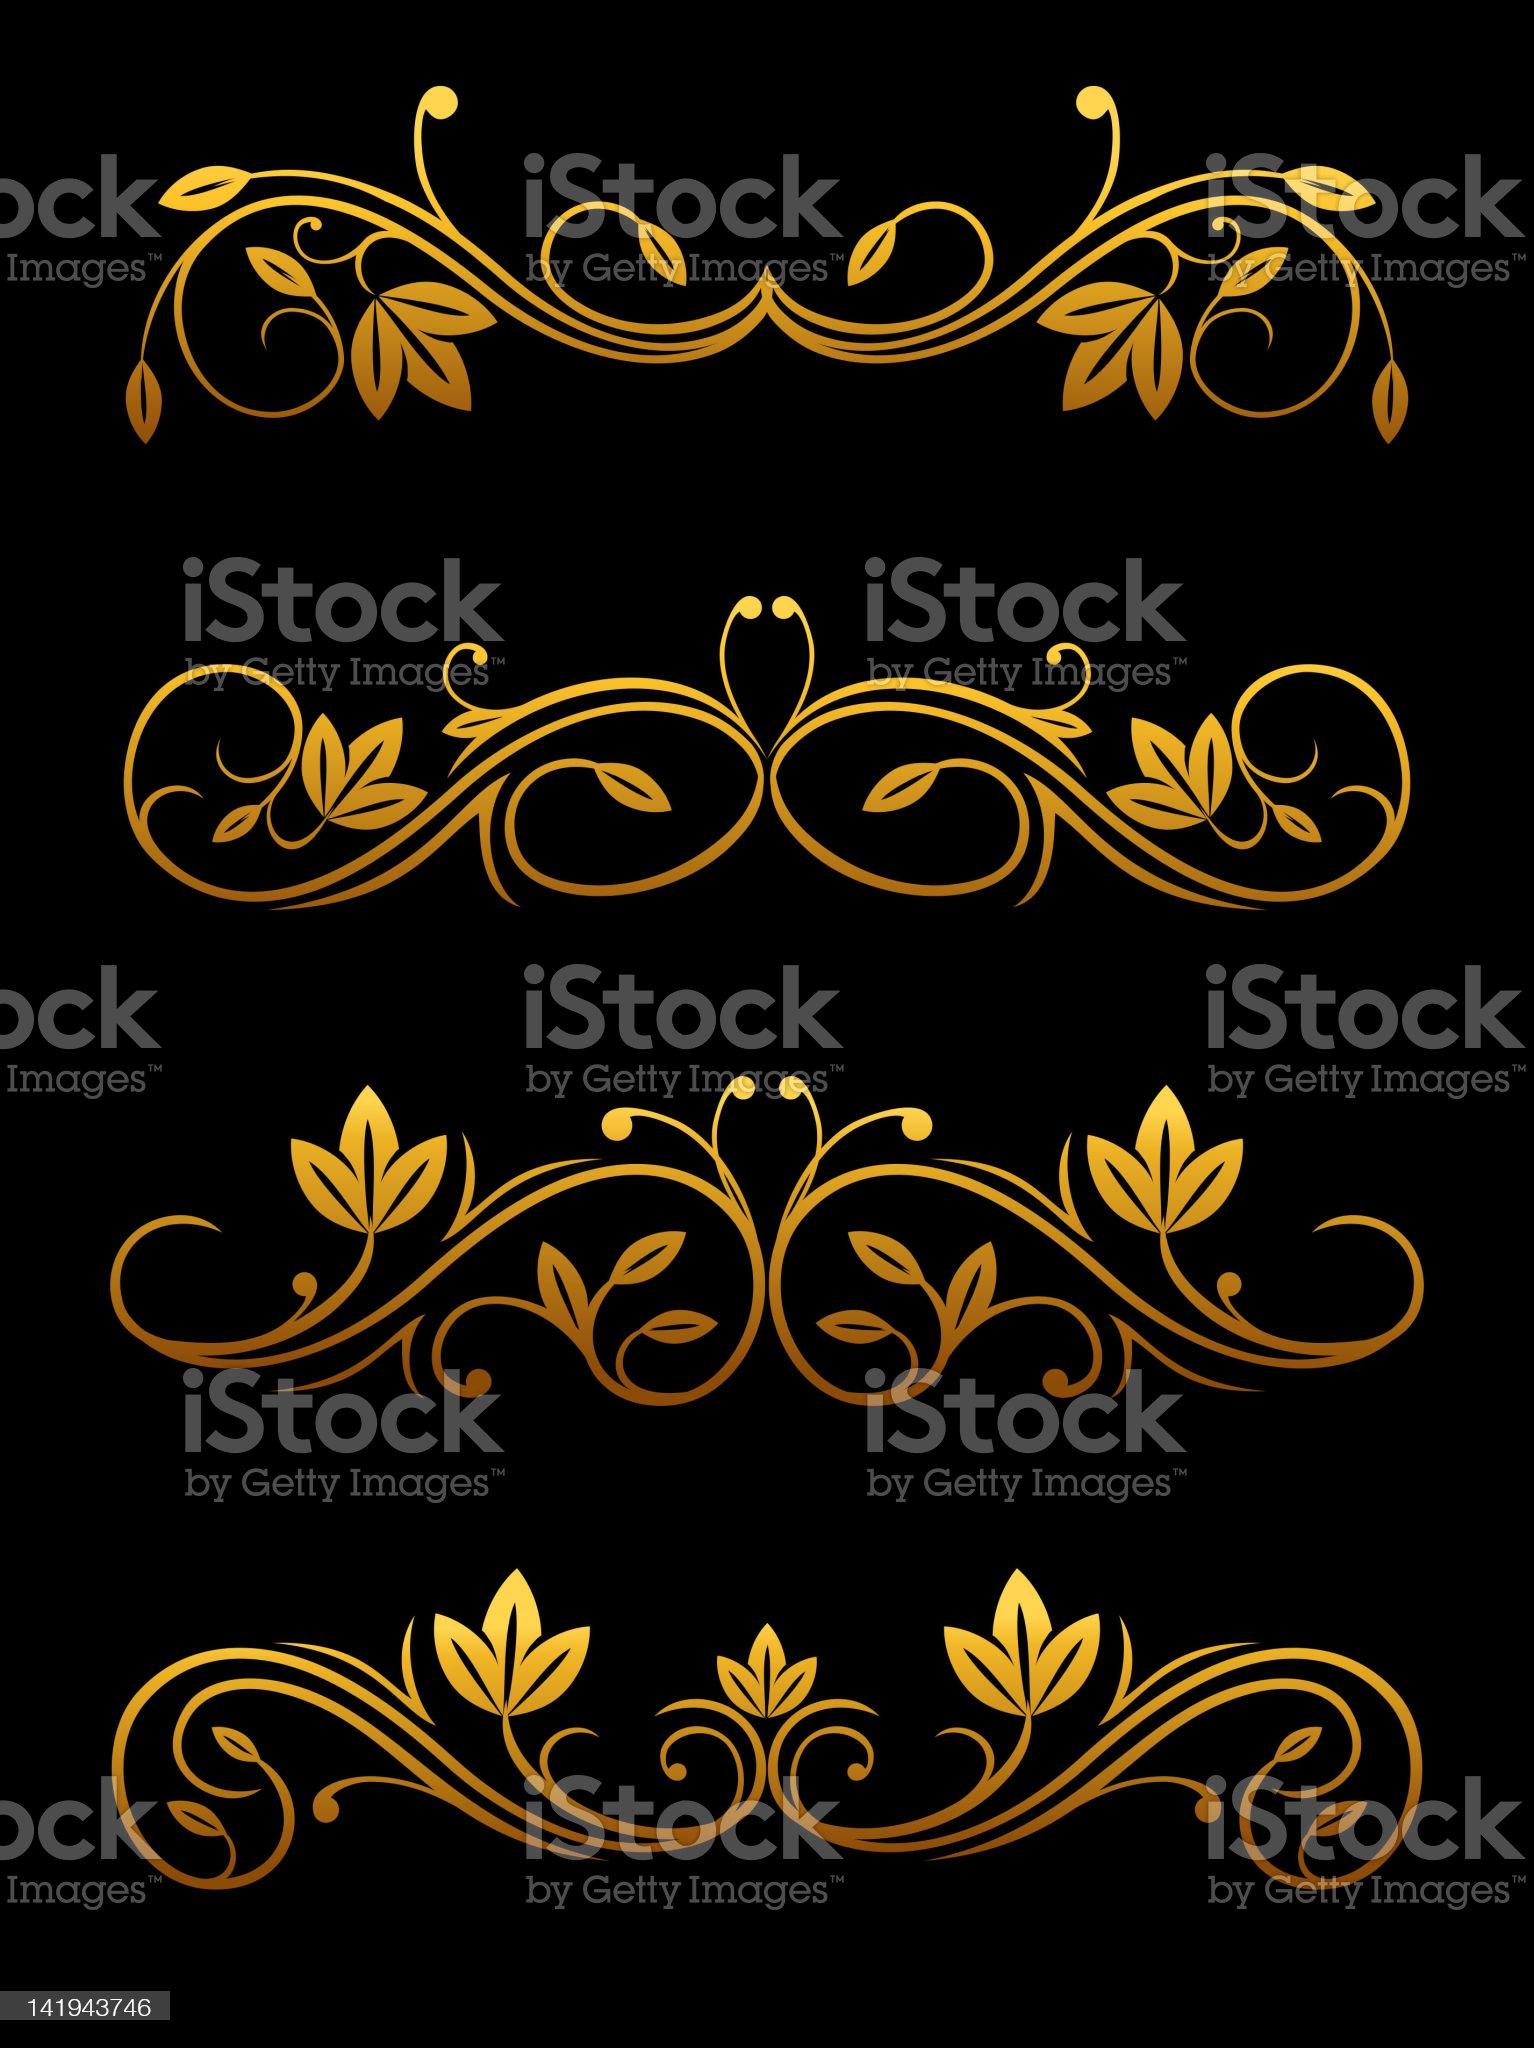 Floral embellishments royalty-free stock vector art